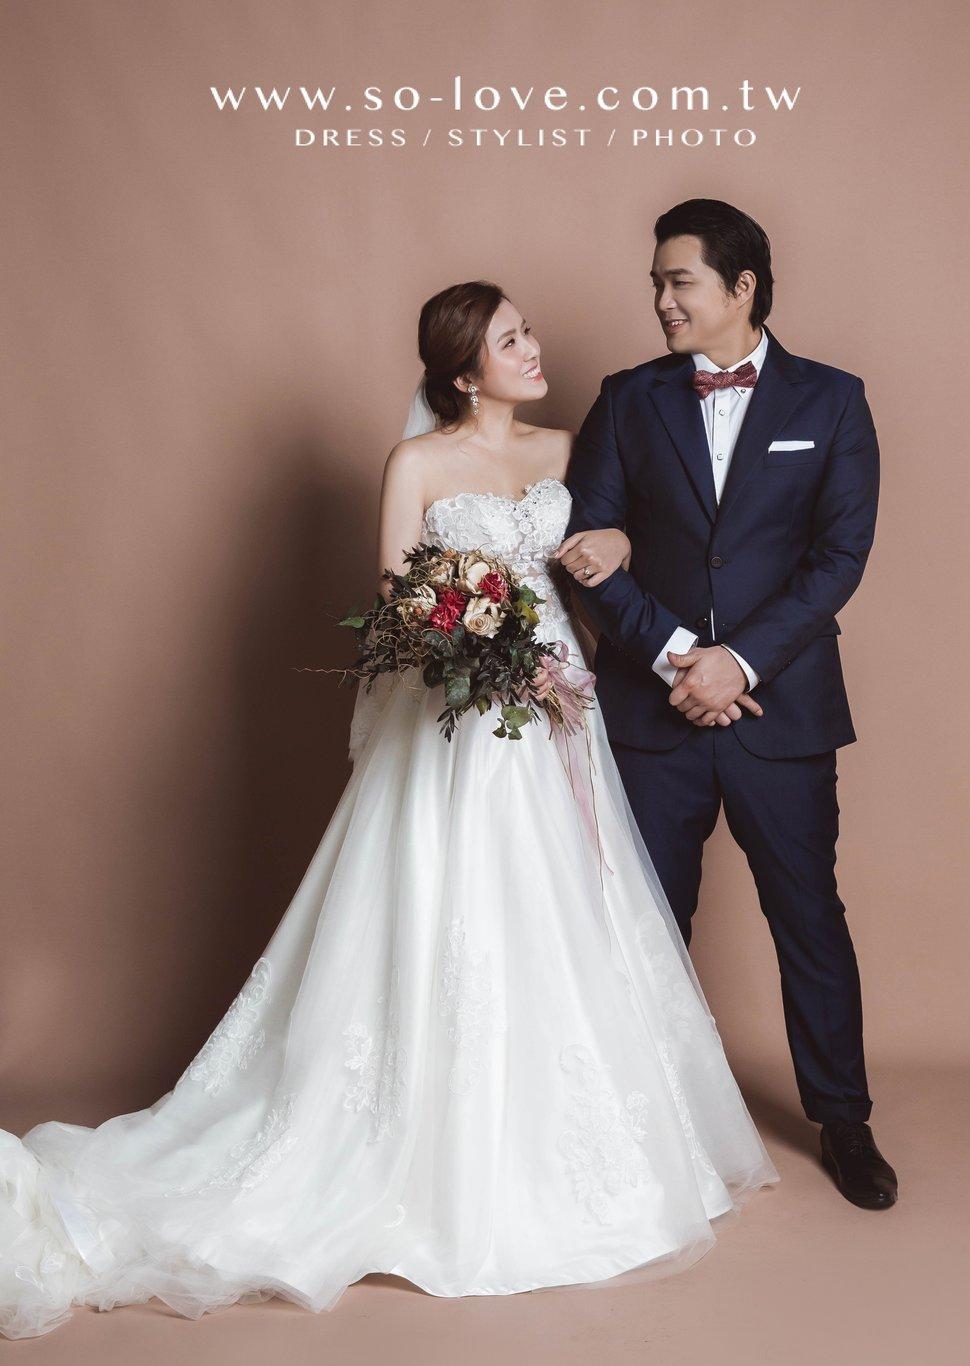 YCG2B8137-裁切 - So.Love Wedding 樂樂蕾絲《結婚吧》